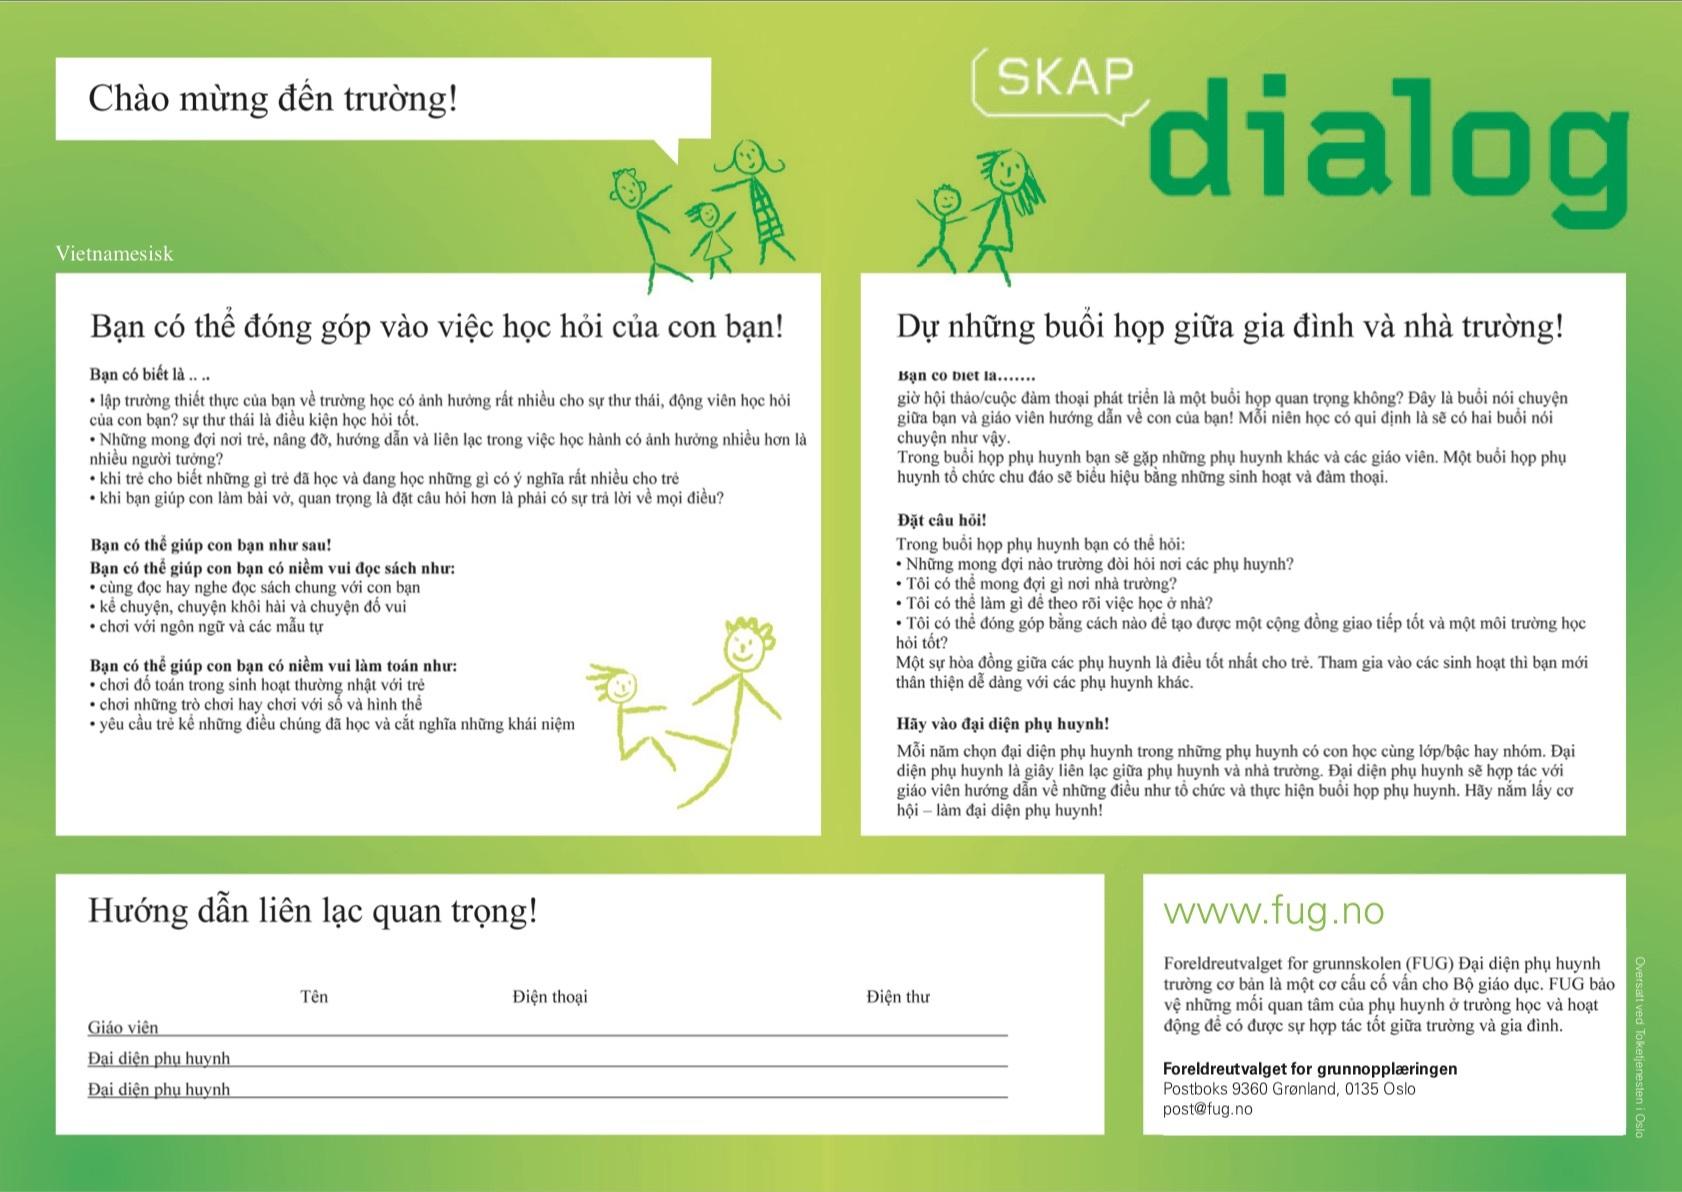 Skap dialog 1 vietnamesisk